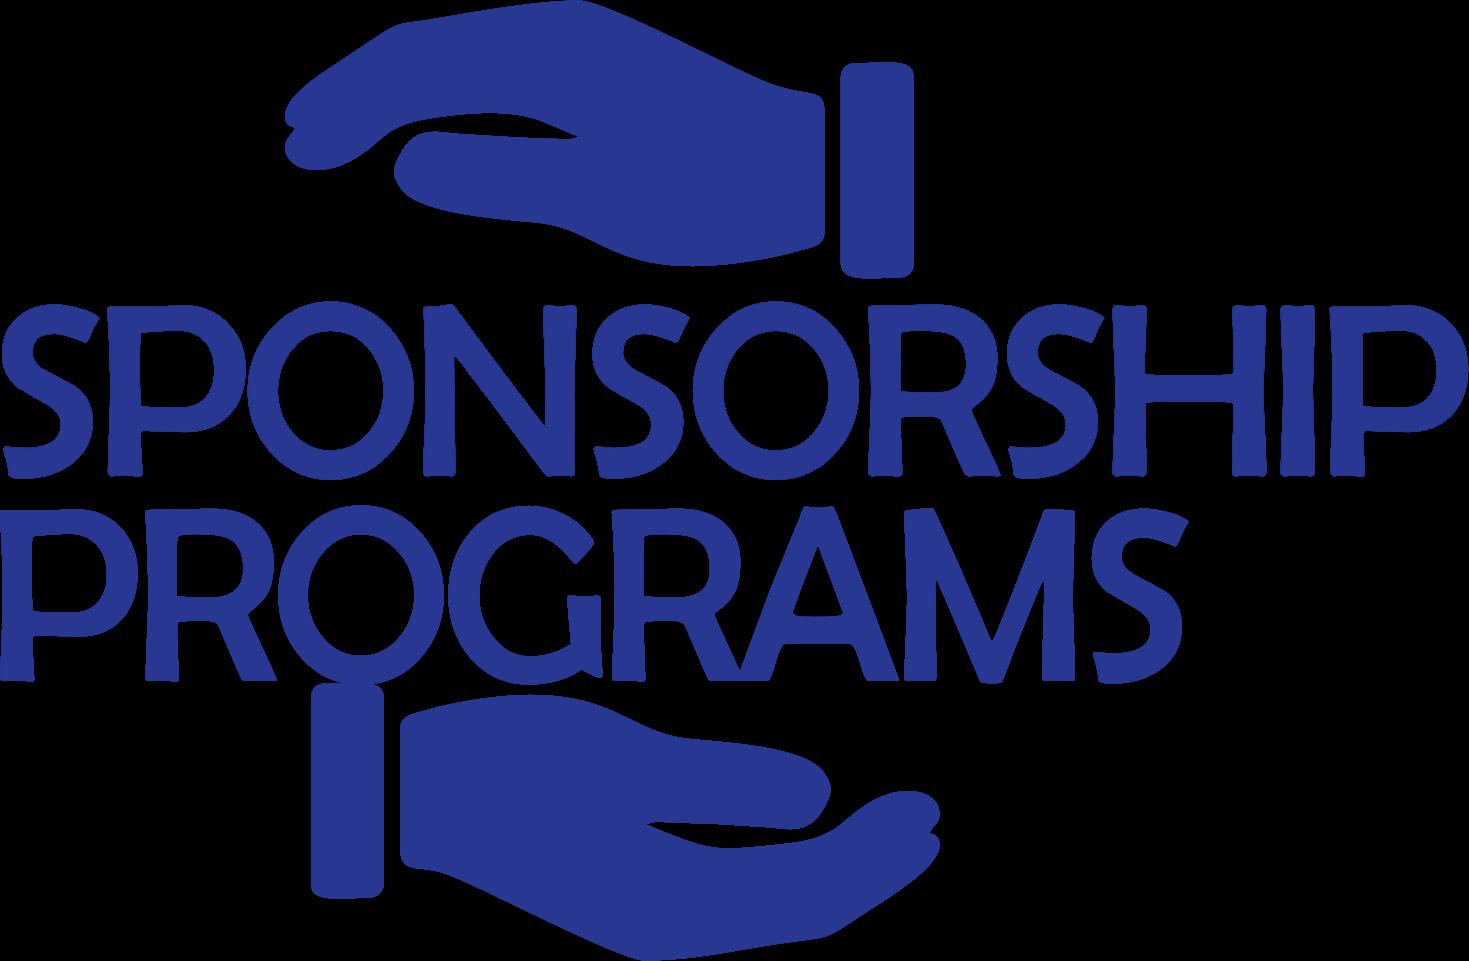 Sponshorship Program